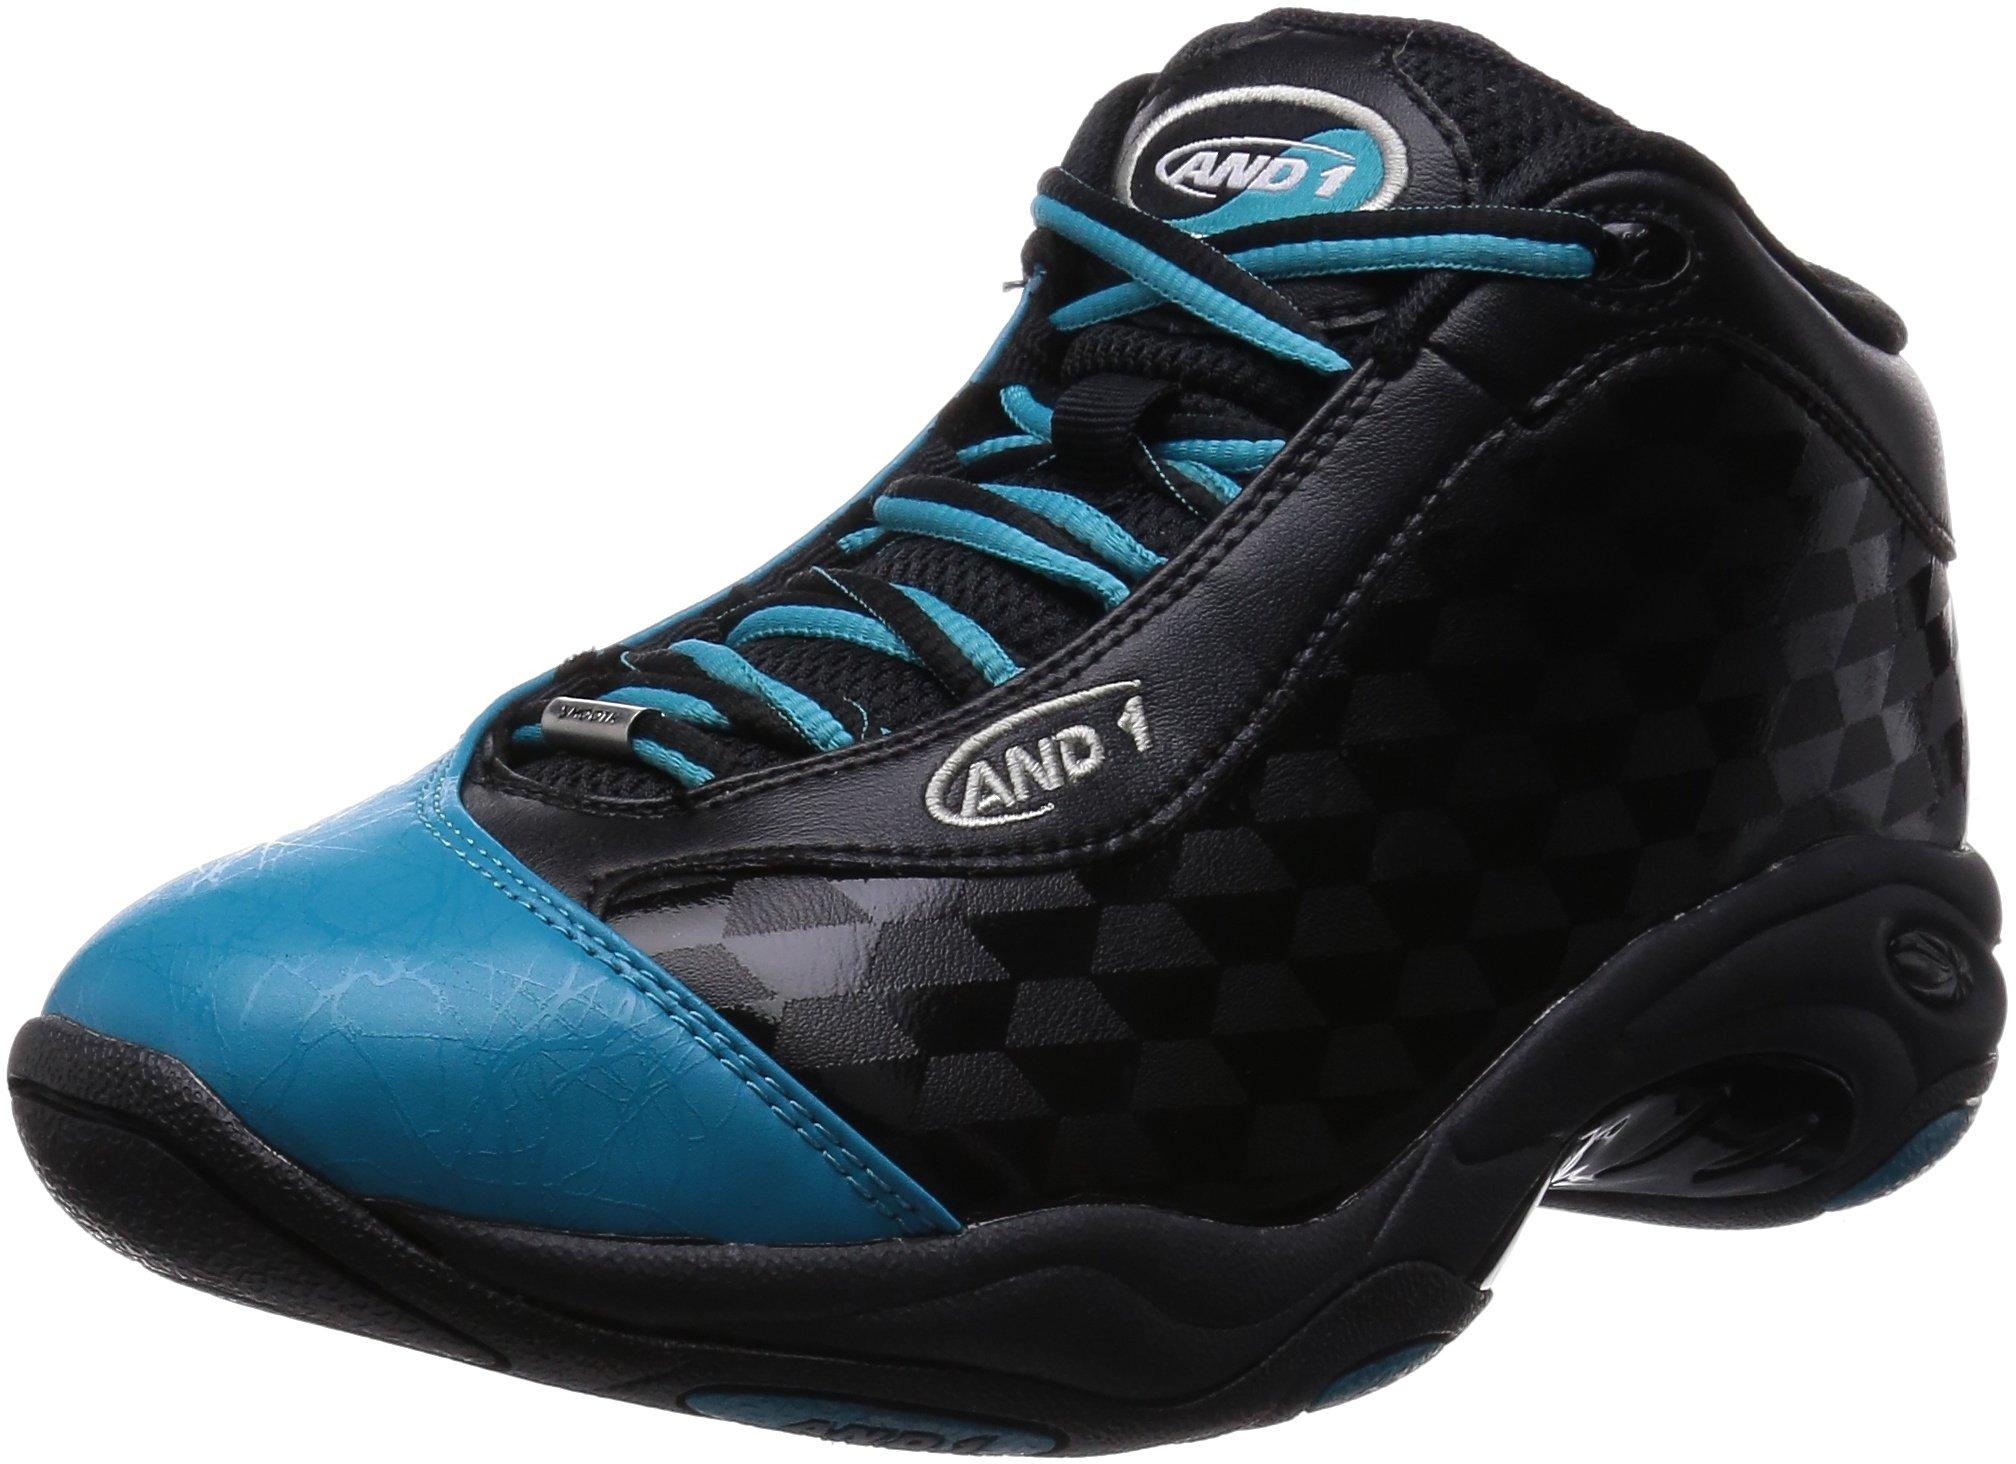 c616164743ae5f Amazon.com | AND 1 Men's Tai Chi Basketball Shoe | Basketball